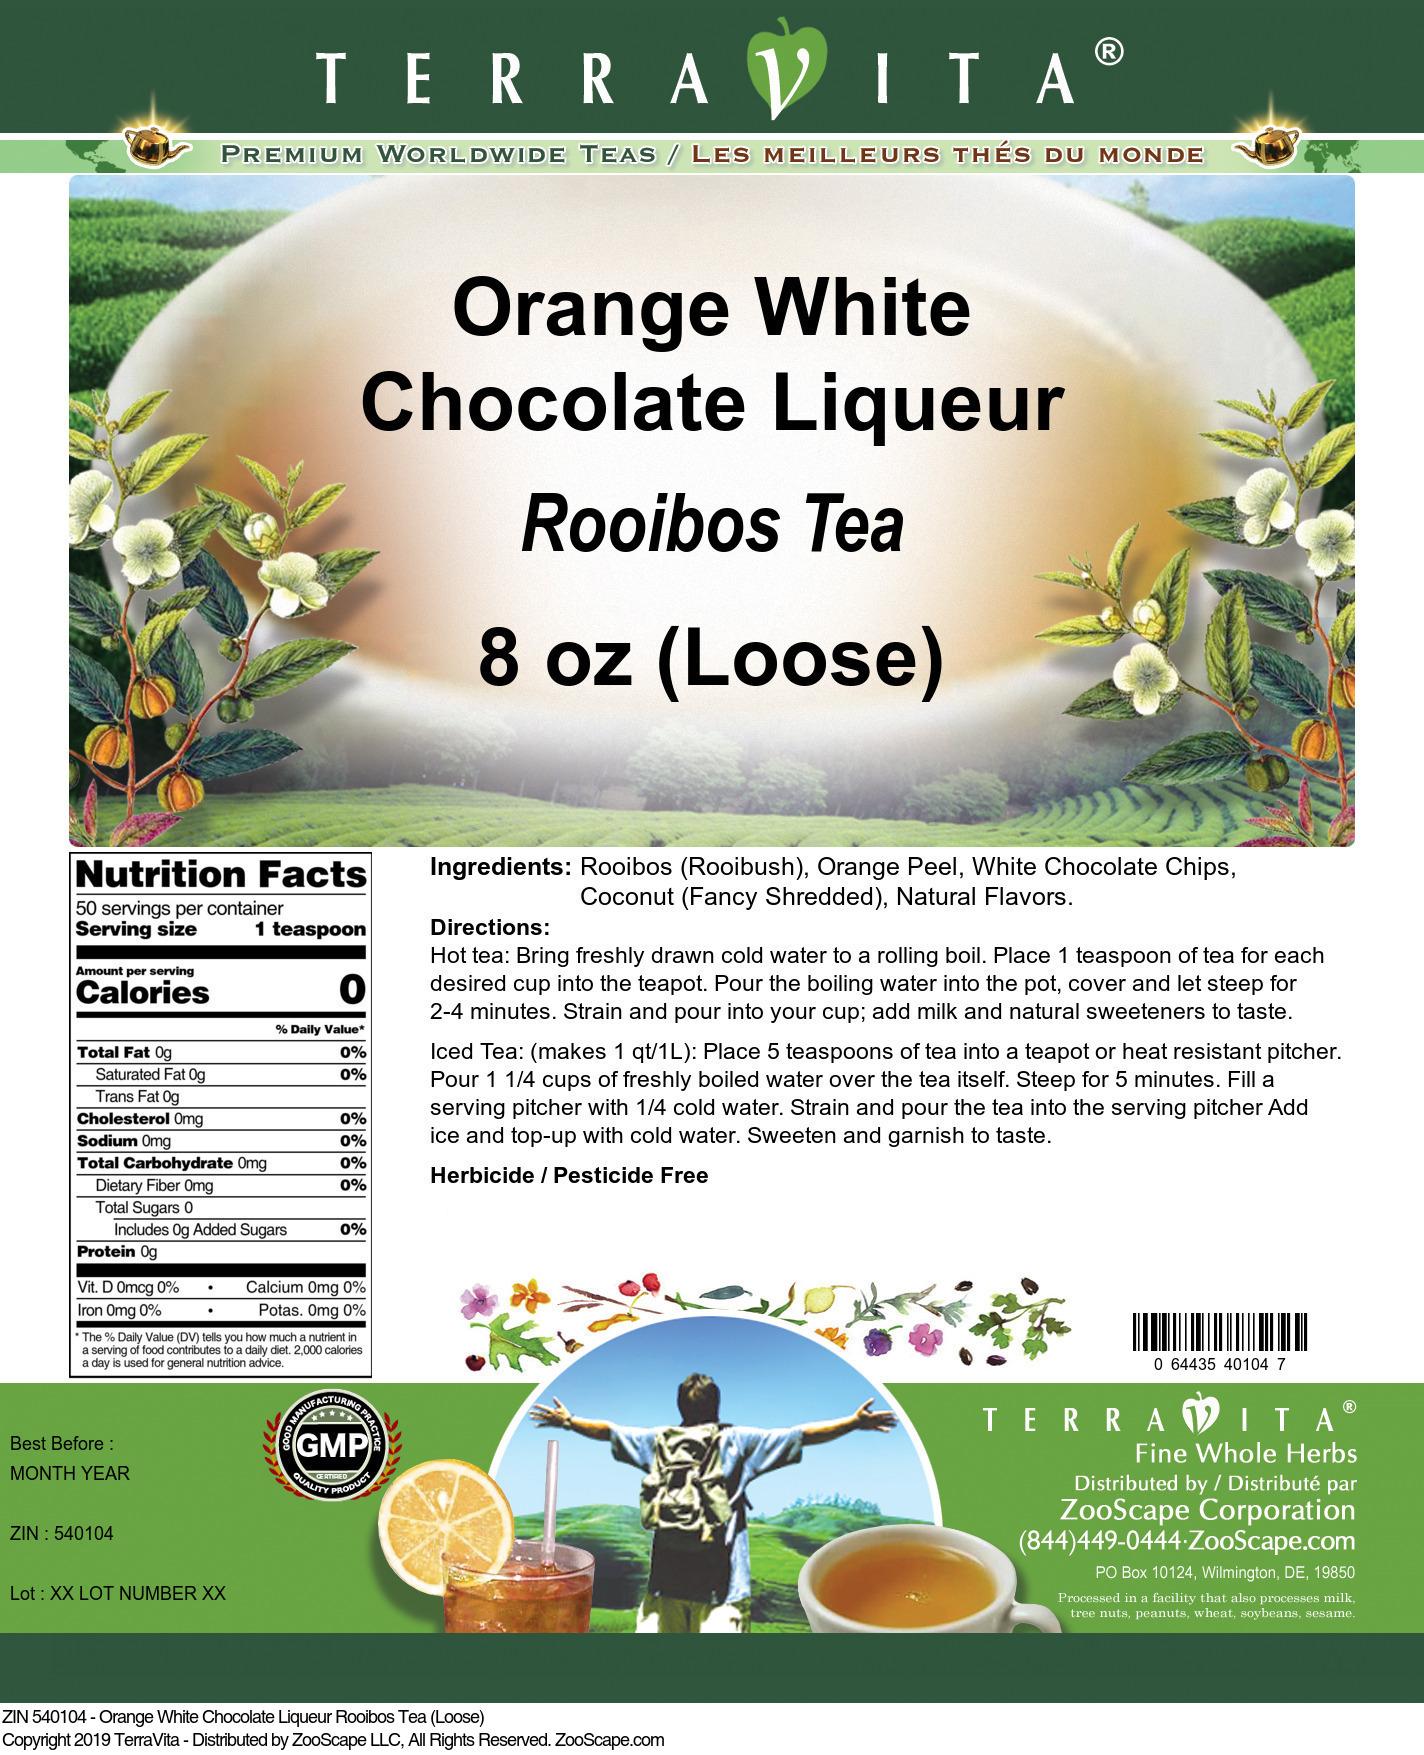 Orange White Chocolate Liqueur Rooibos Tea